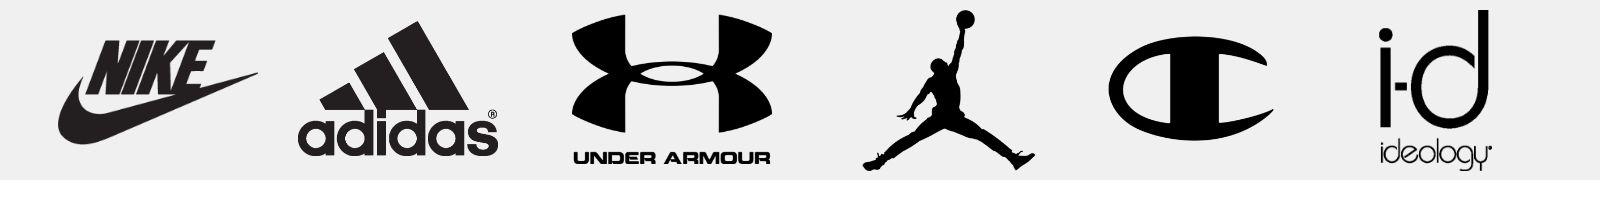 Nike, adidas, Under Armour, ideology